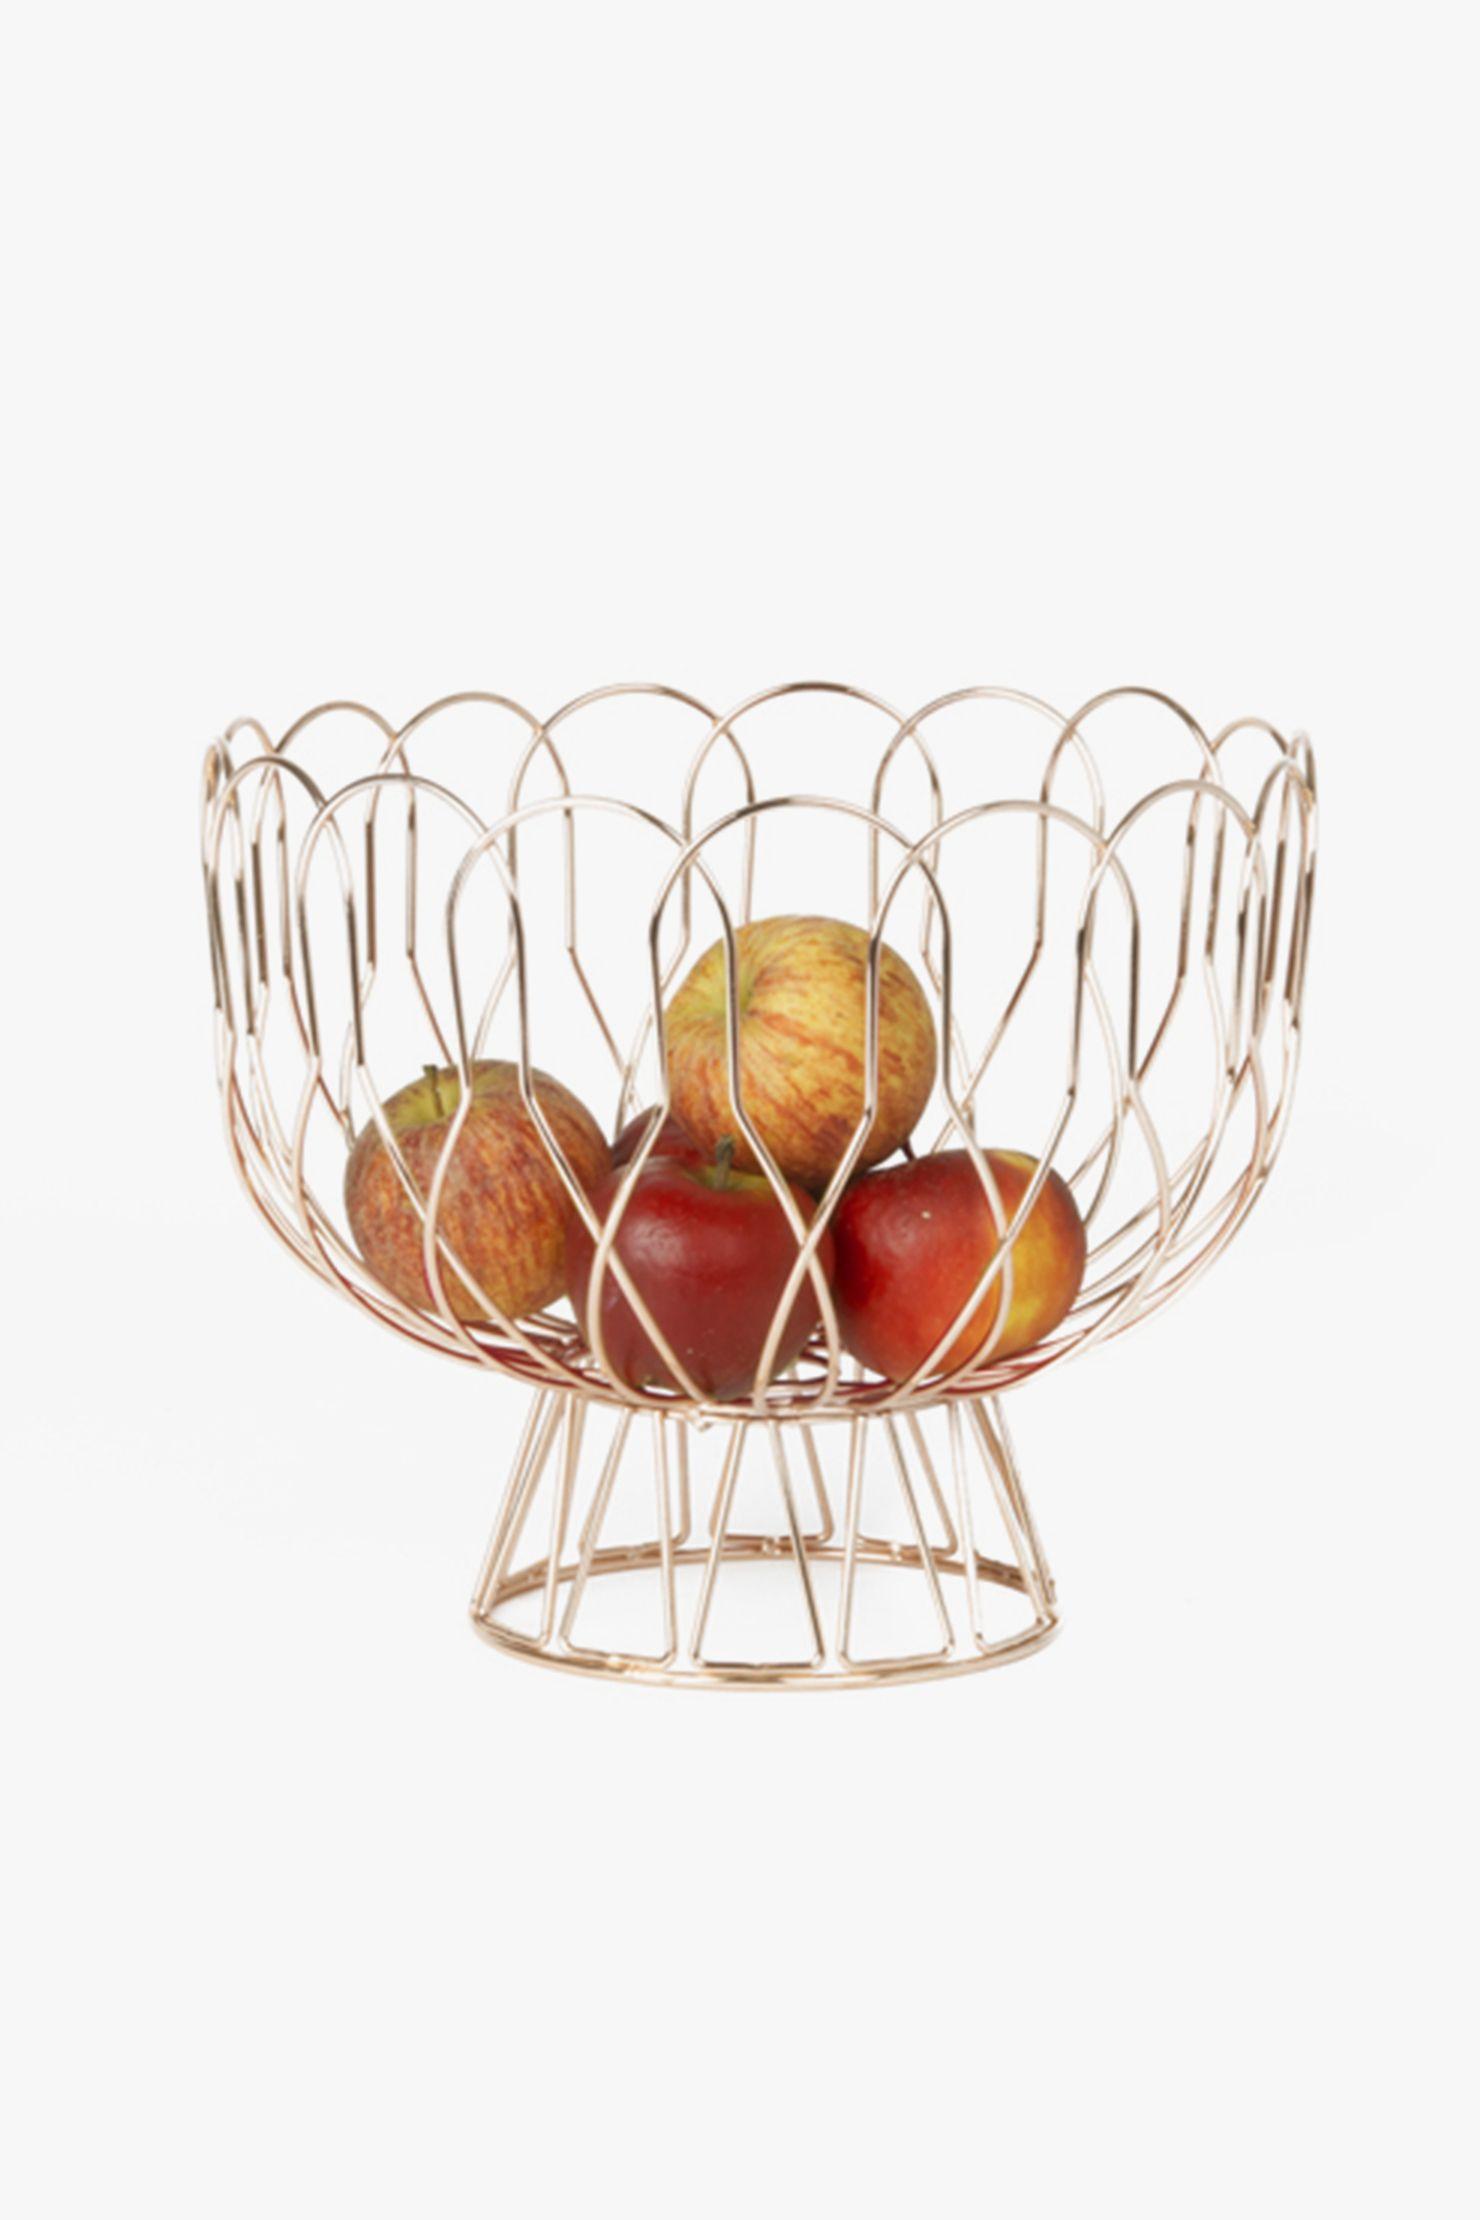 22 euros corbeille fruits m tal cuivr ikea cie. Black Bedroom Furniture Sets. Home Design Ideas